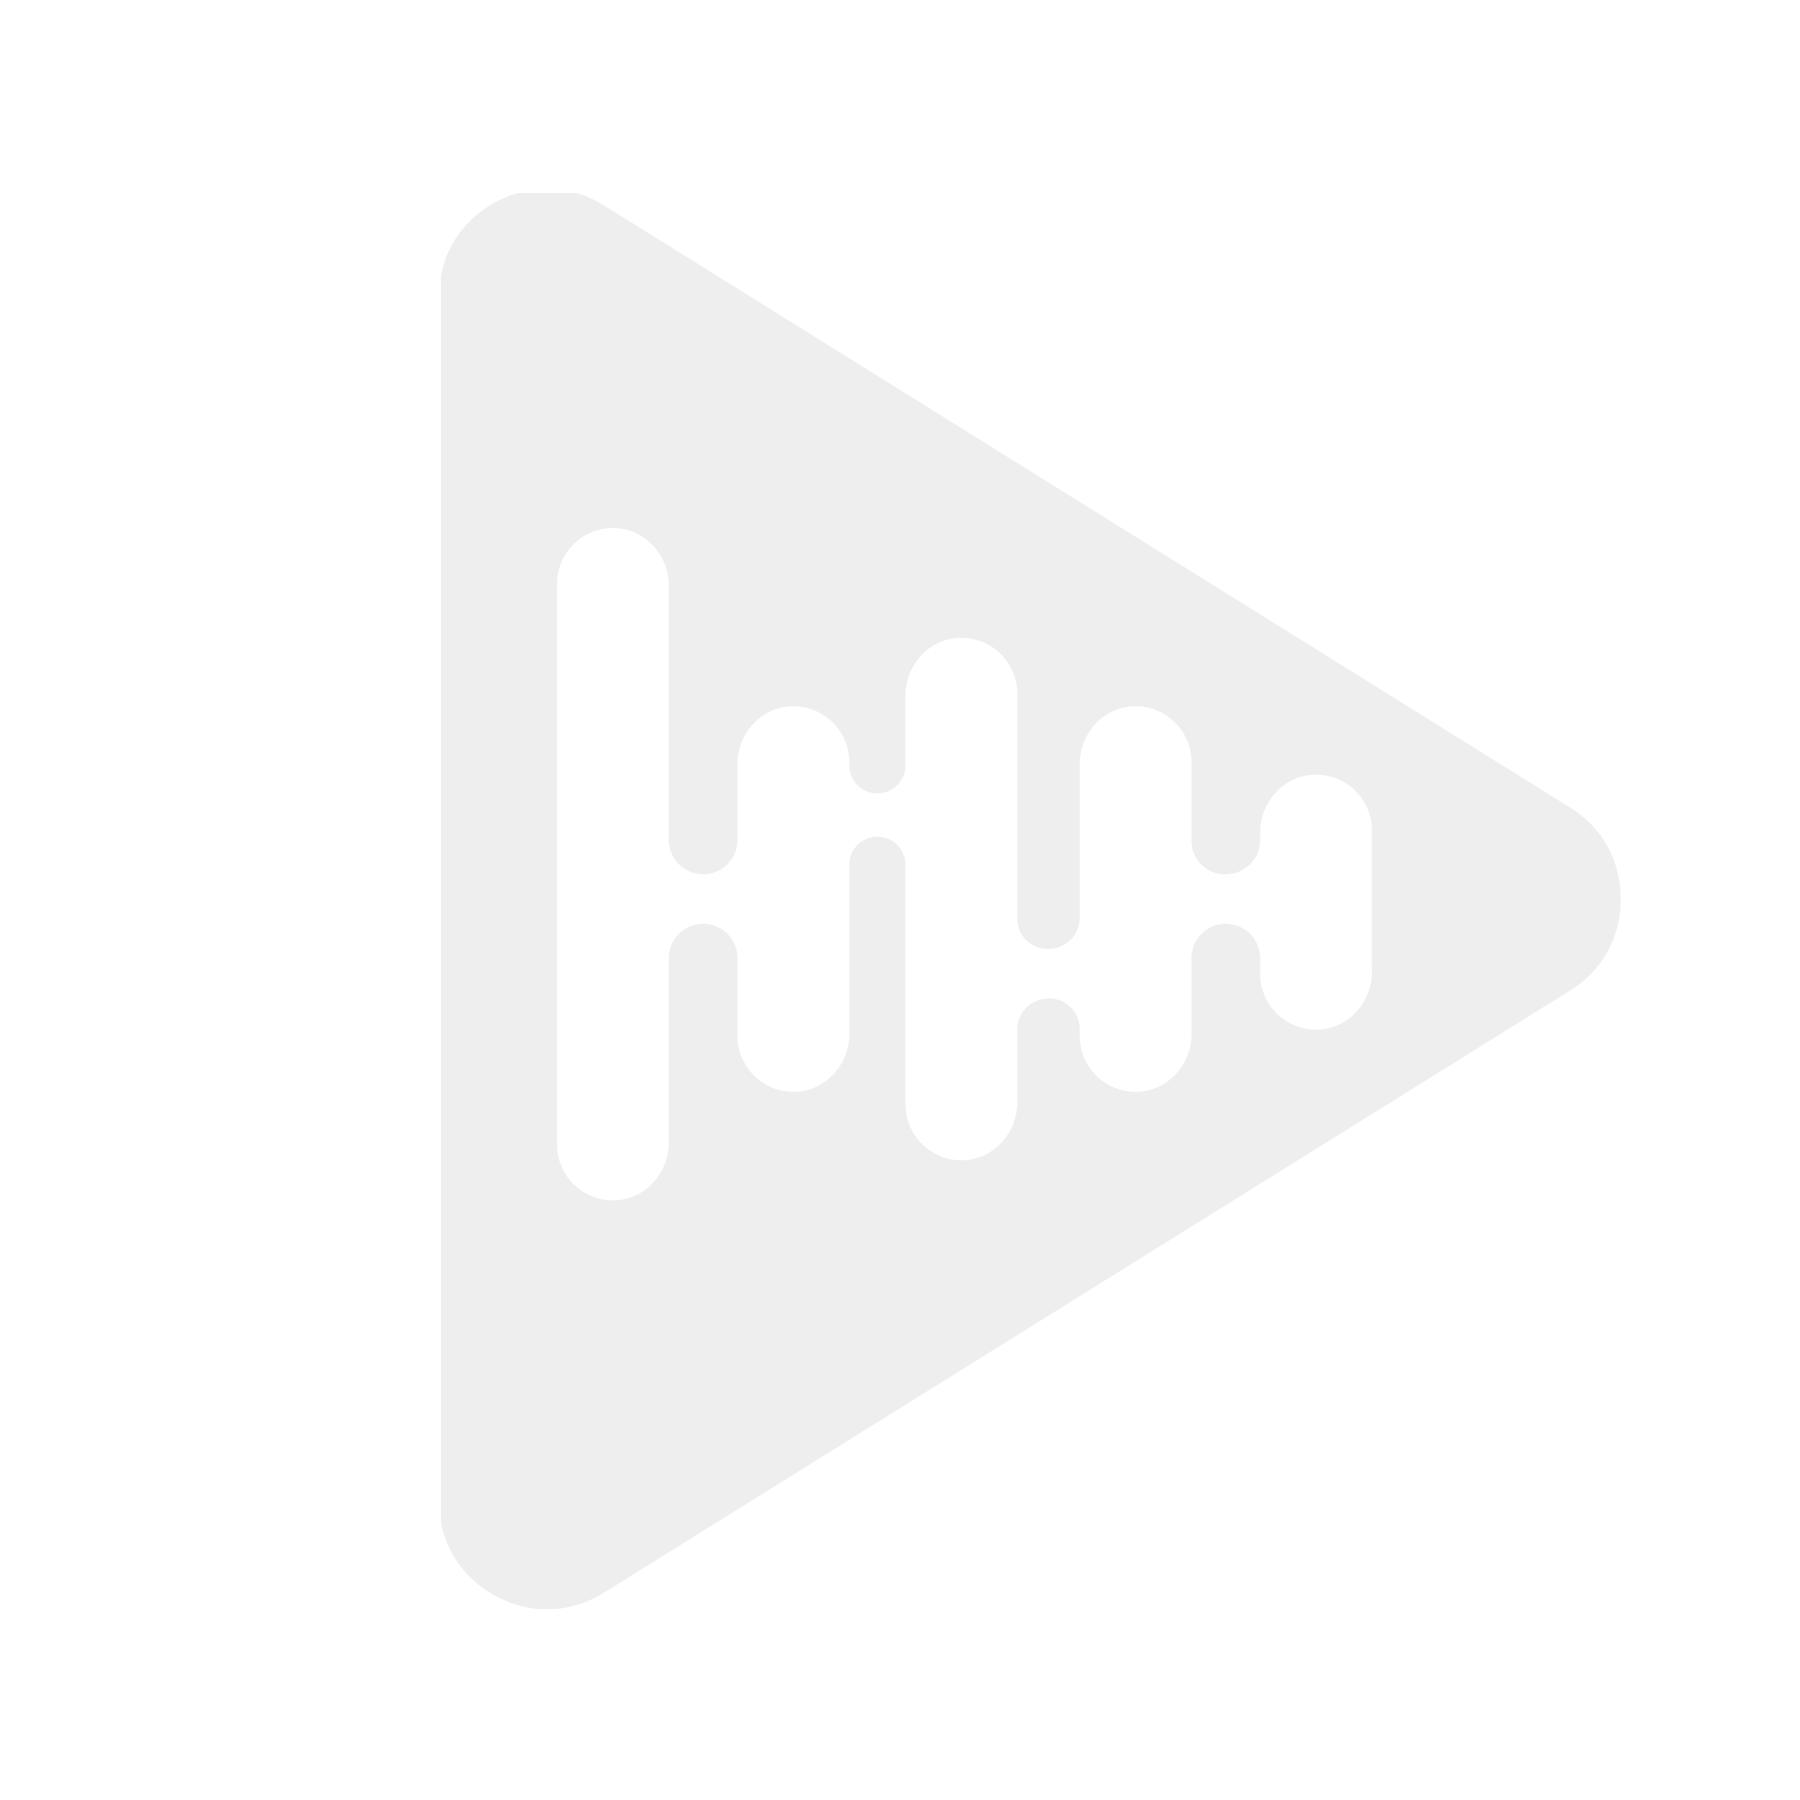 Connect GR00009 - Universal høyttalergrill, 100mm/4